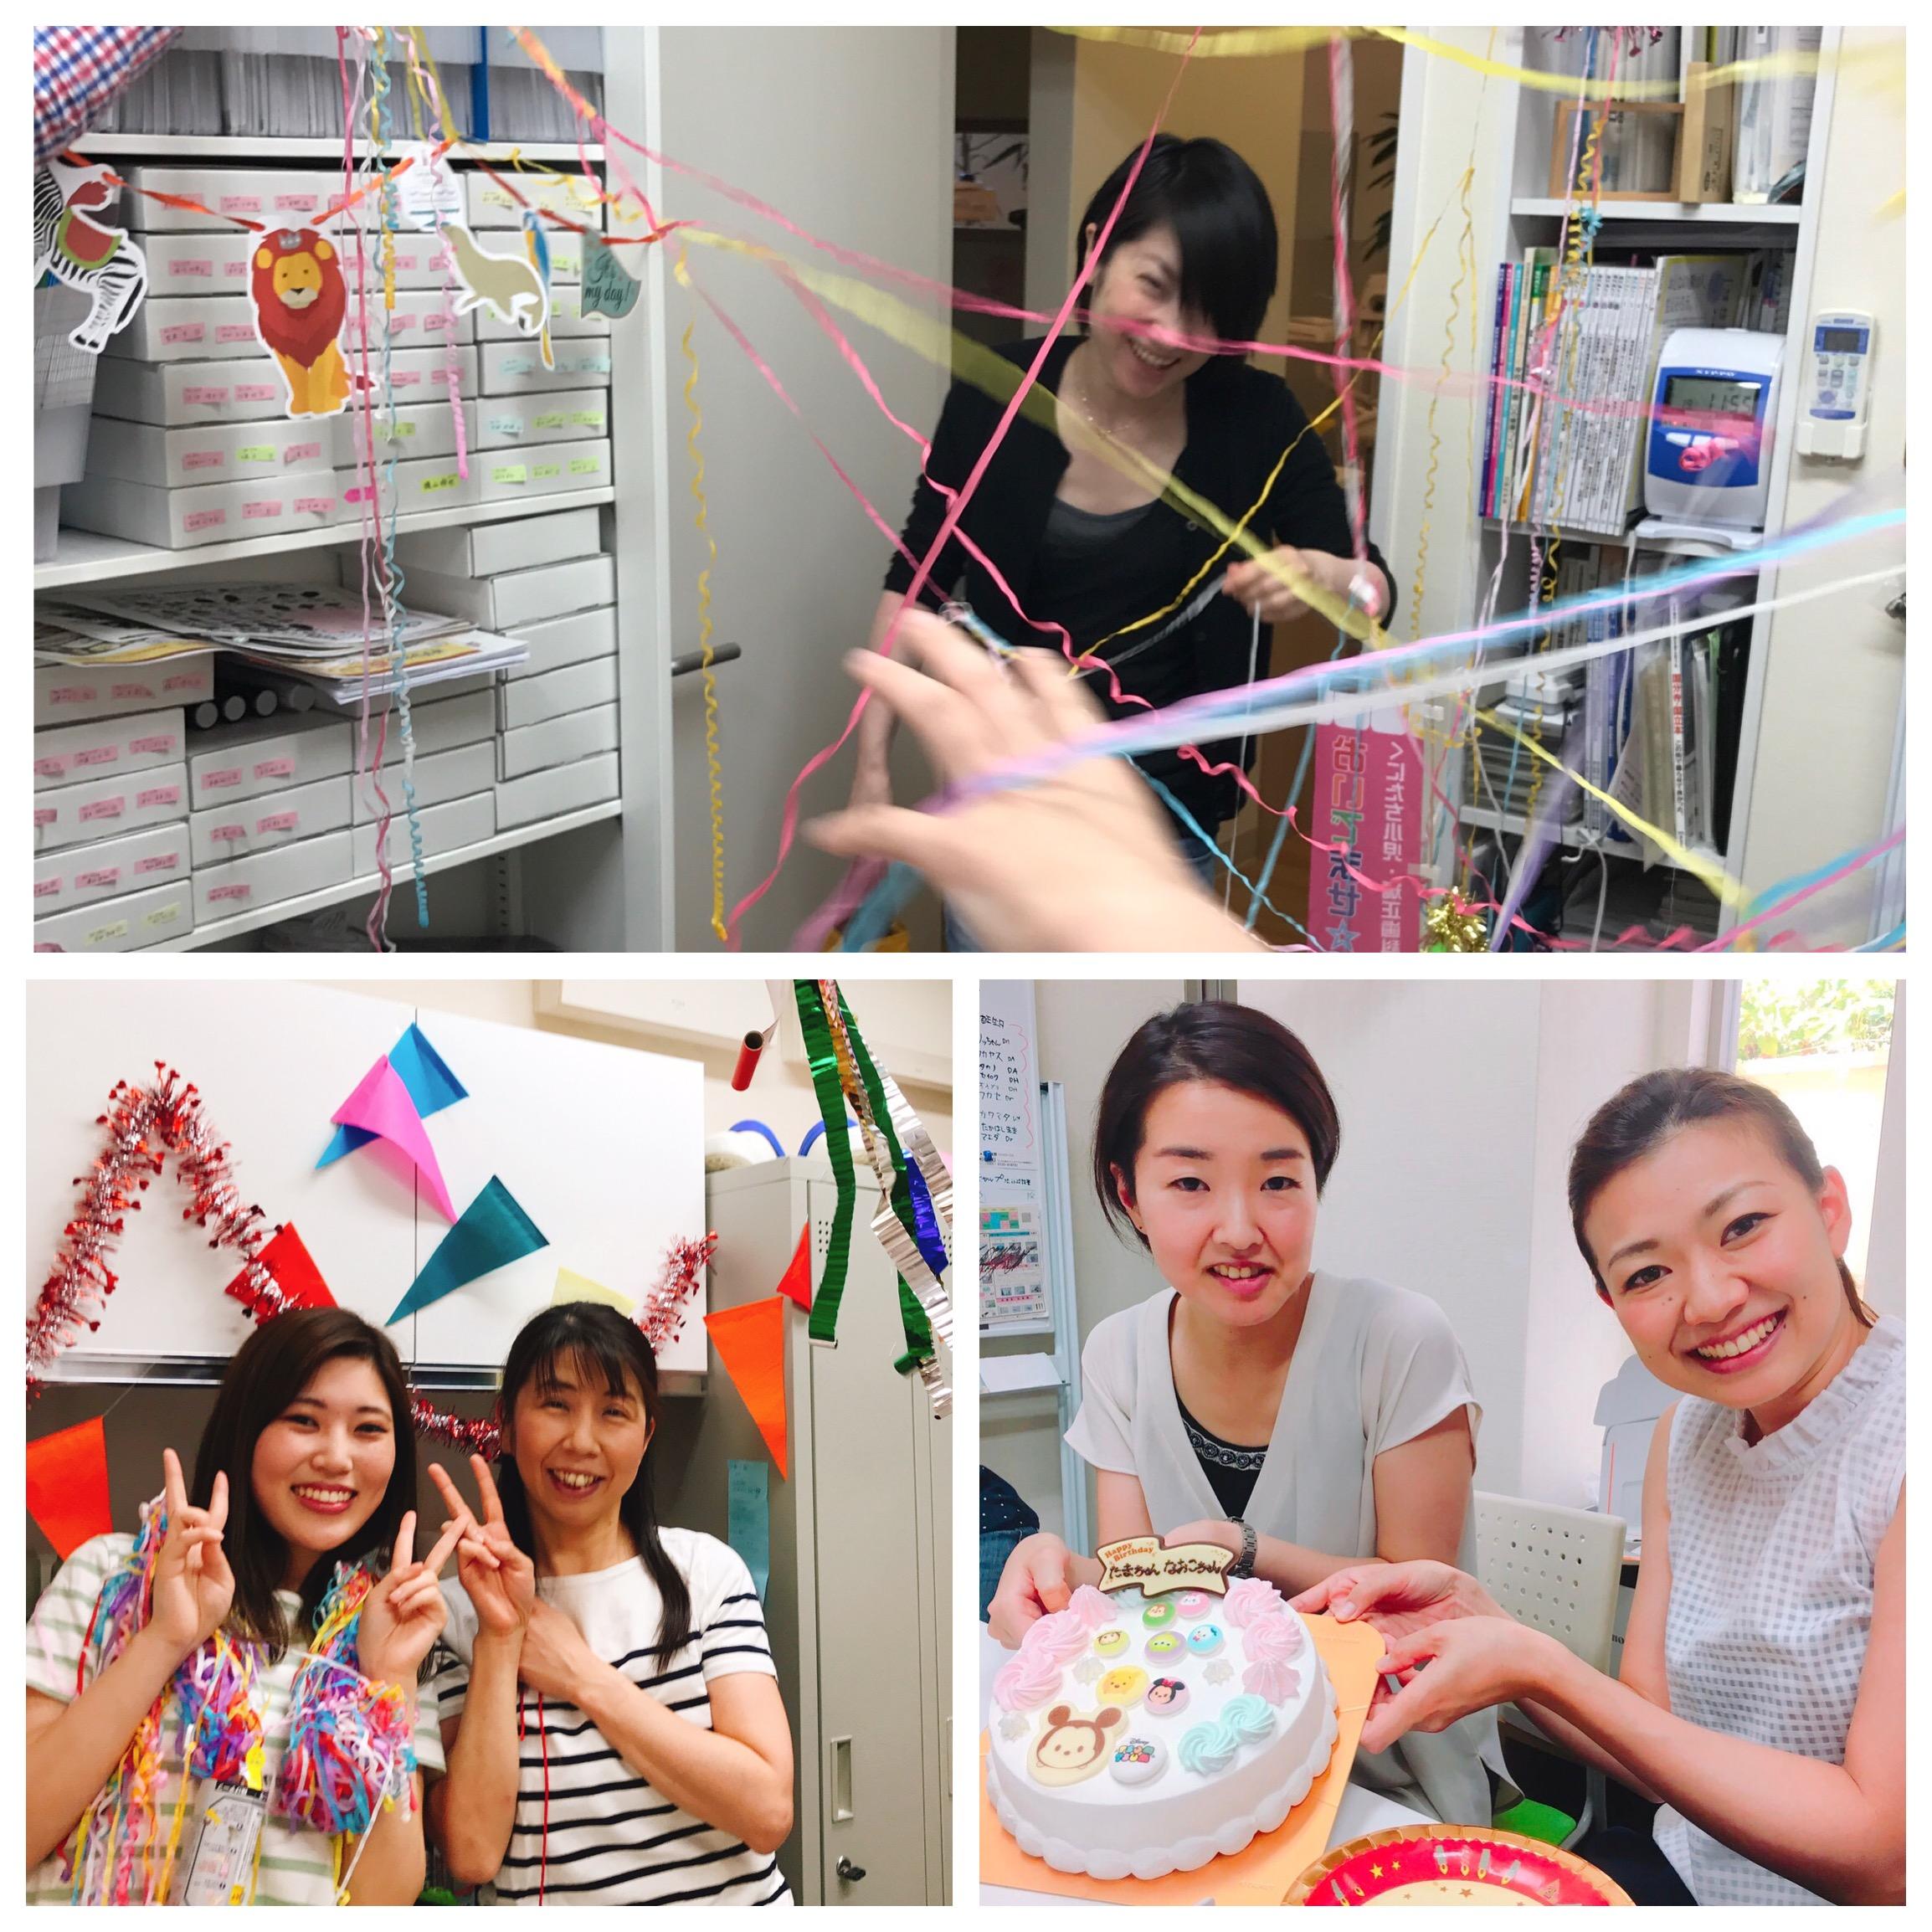 http://www.kunitachi-kodomo.com/blog/staff/IMG_0495.JPG